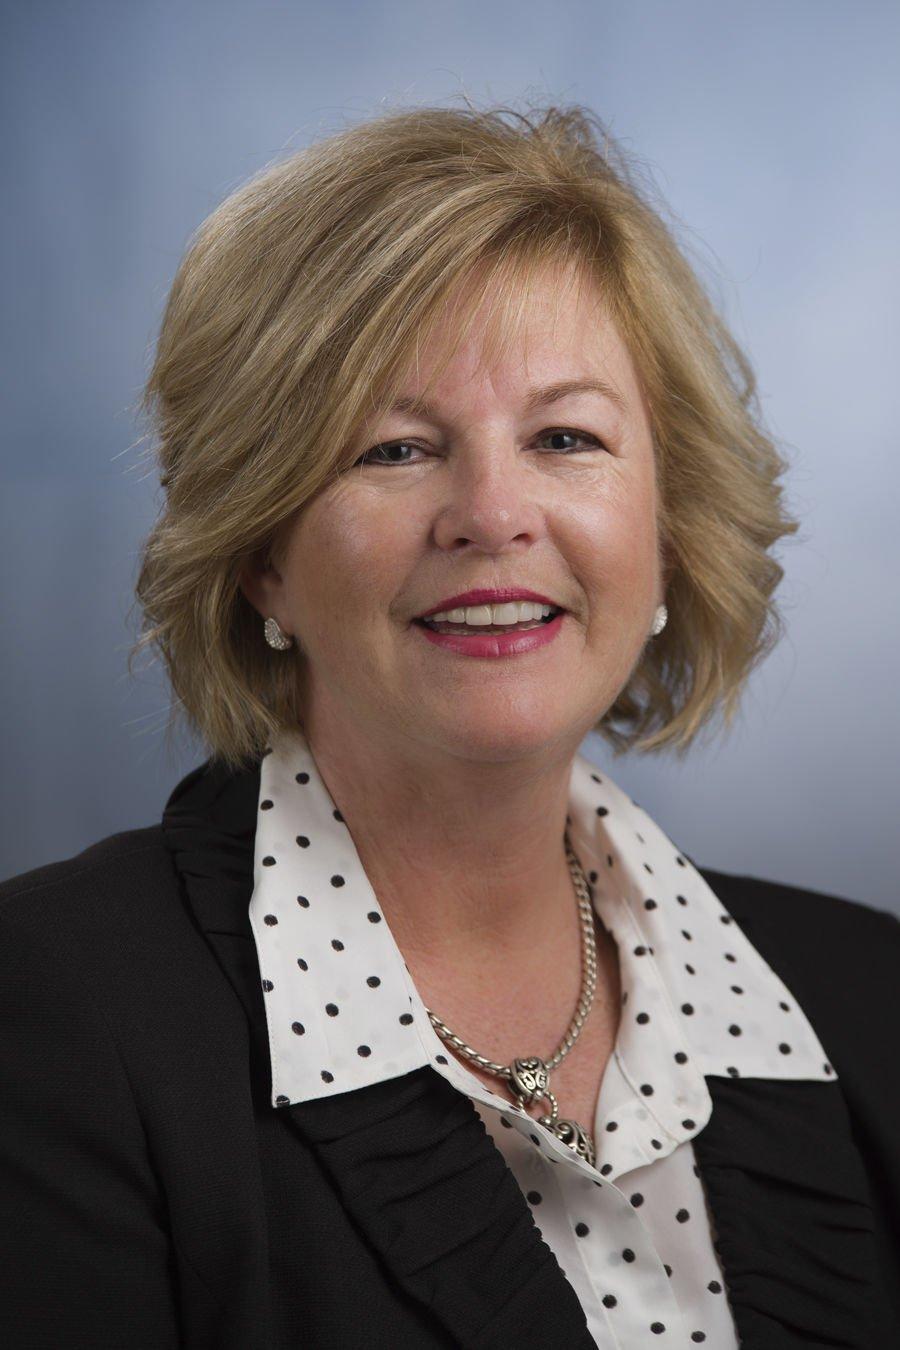 Natalie Seaber, RN, MHA, CNML, regional chief nursing officer, Lutheran Health Network